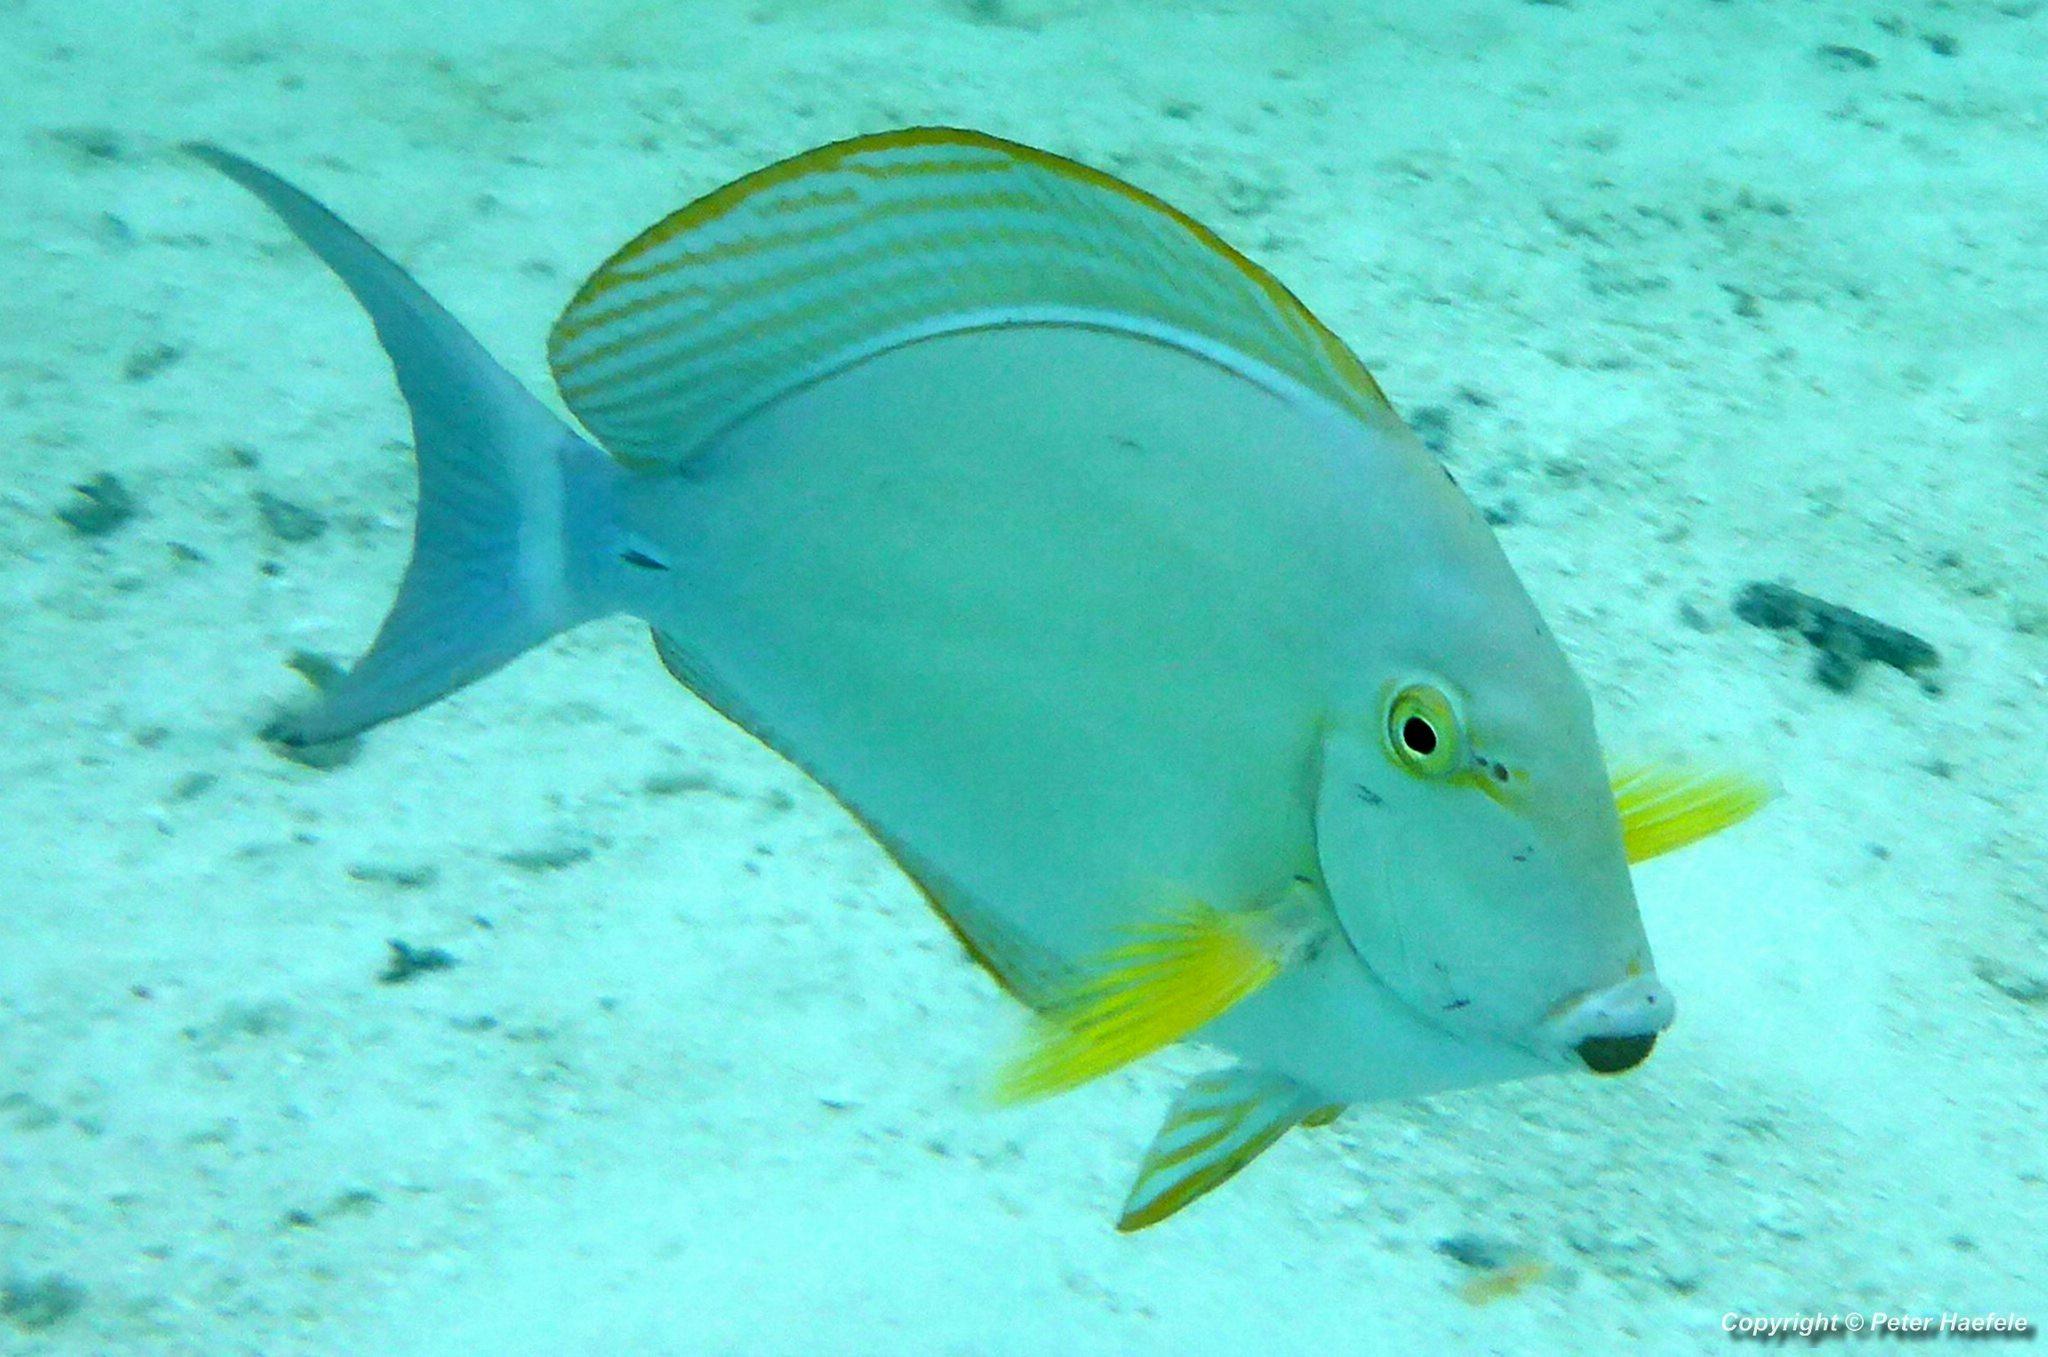 Gelbflossen-Doktorfisch Yellowfin surgeonfish South Ari-Atoll Maldives